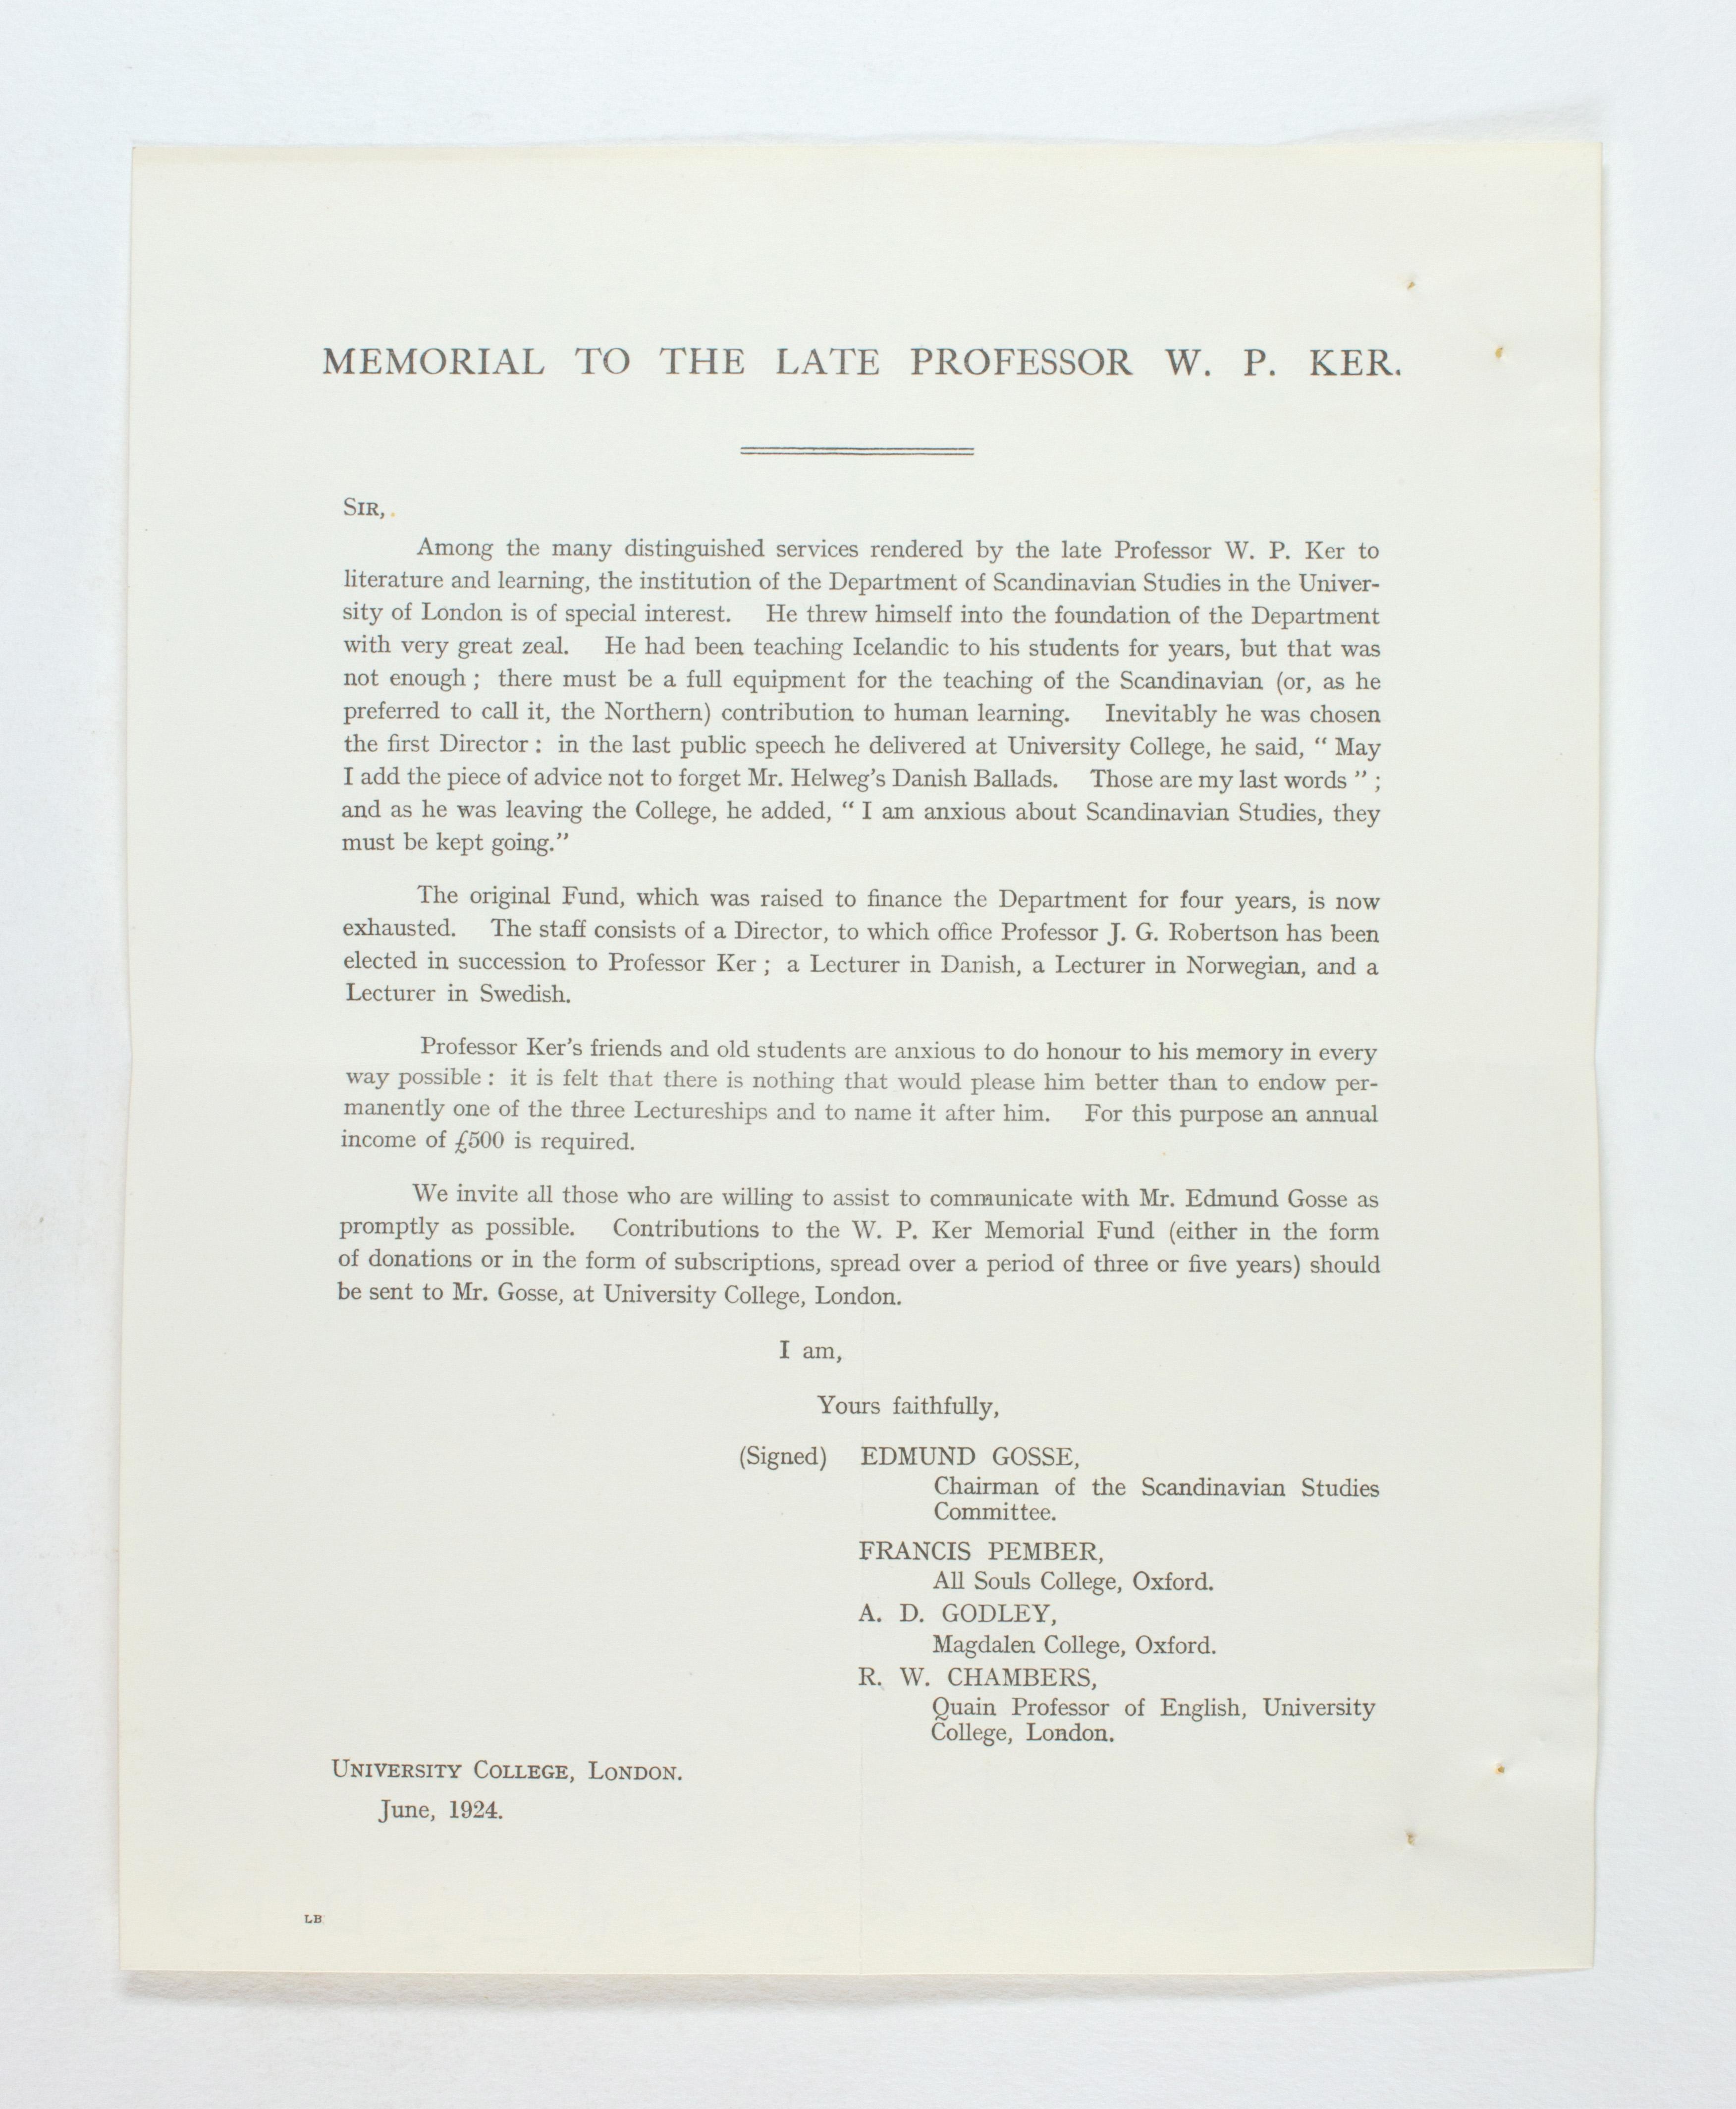 1923-24 Qau el-Kebir, Hemamieh Other PMA/WFP1/D/27/6.2